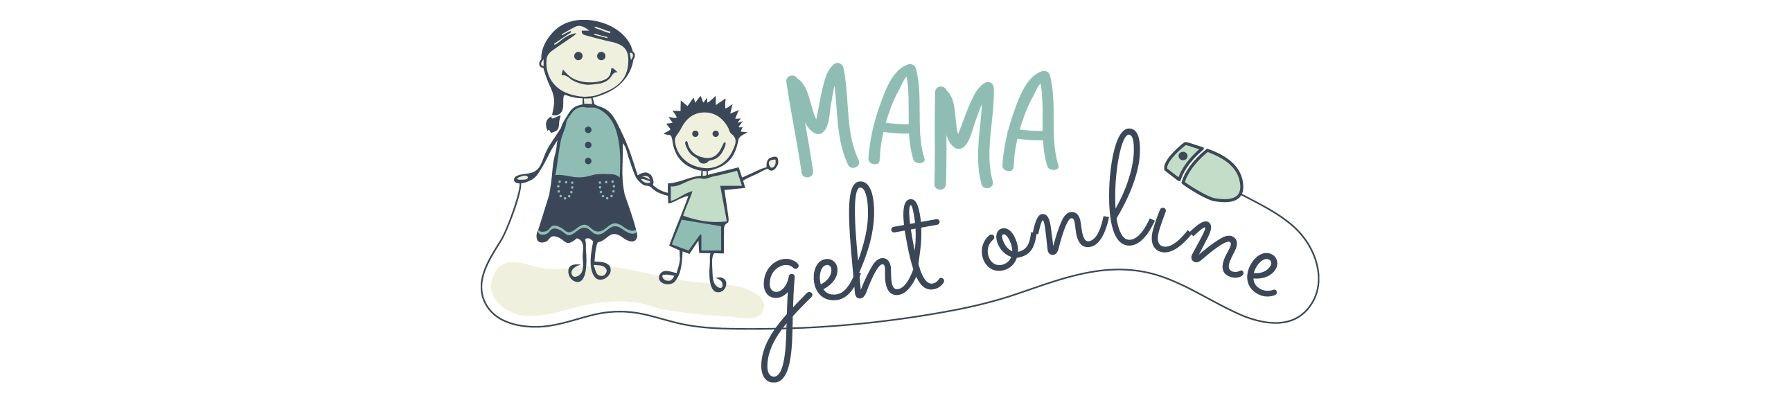 Mama geht online